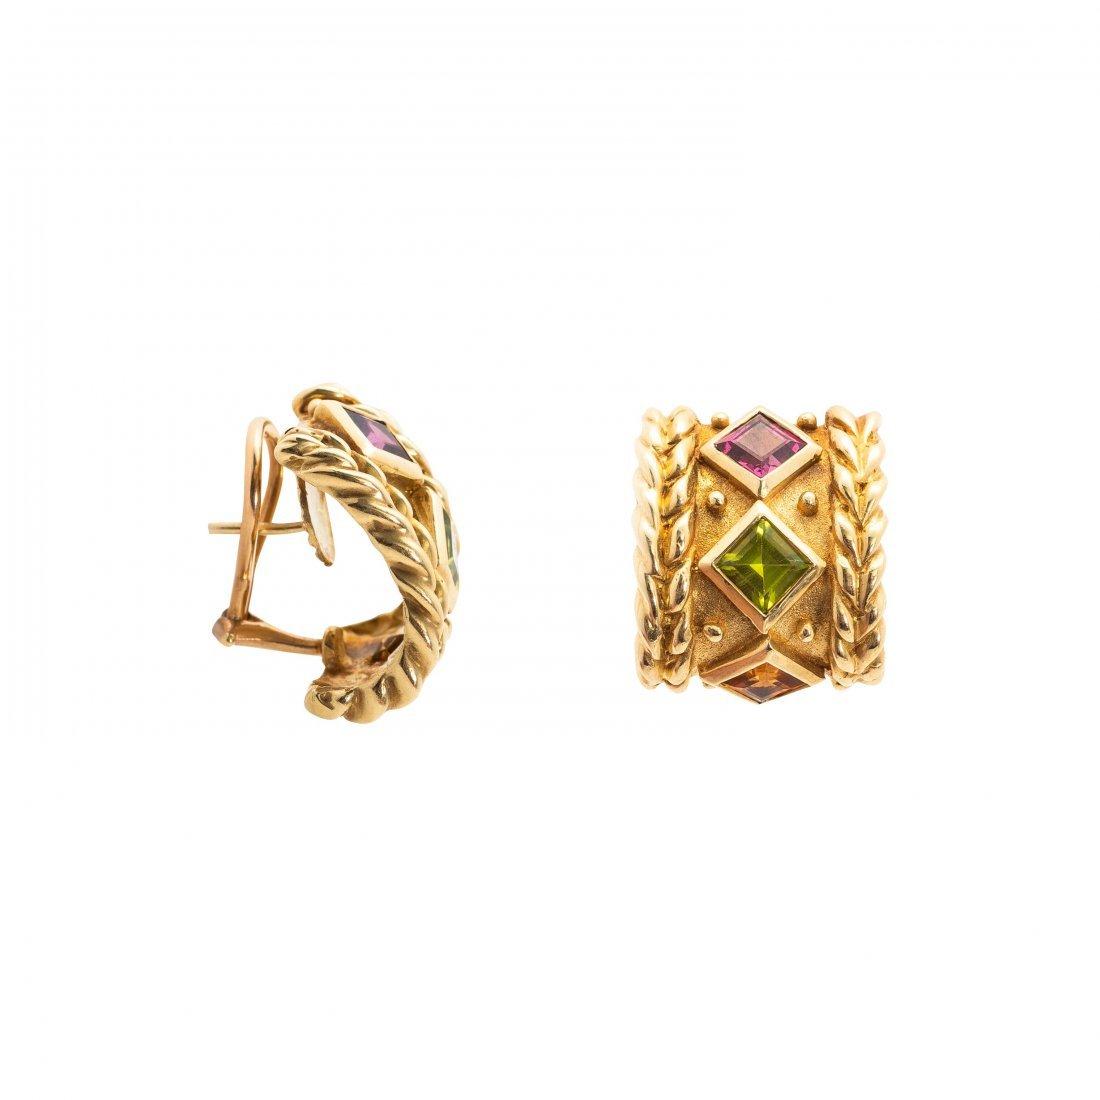 Pair of Tourmaline and Peridot Earrings